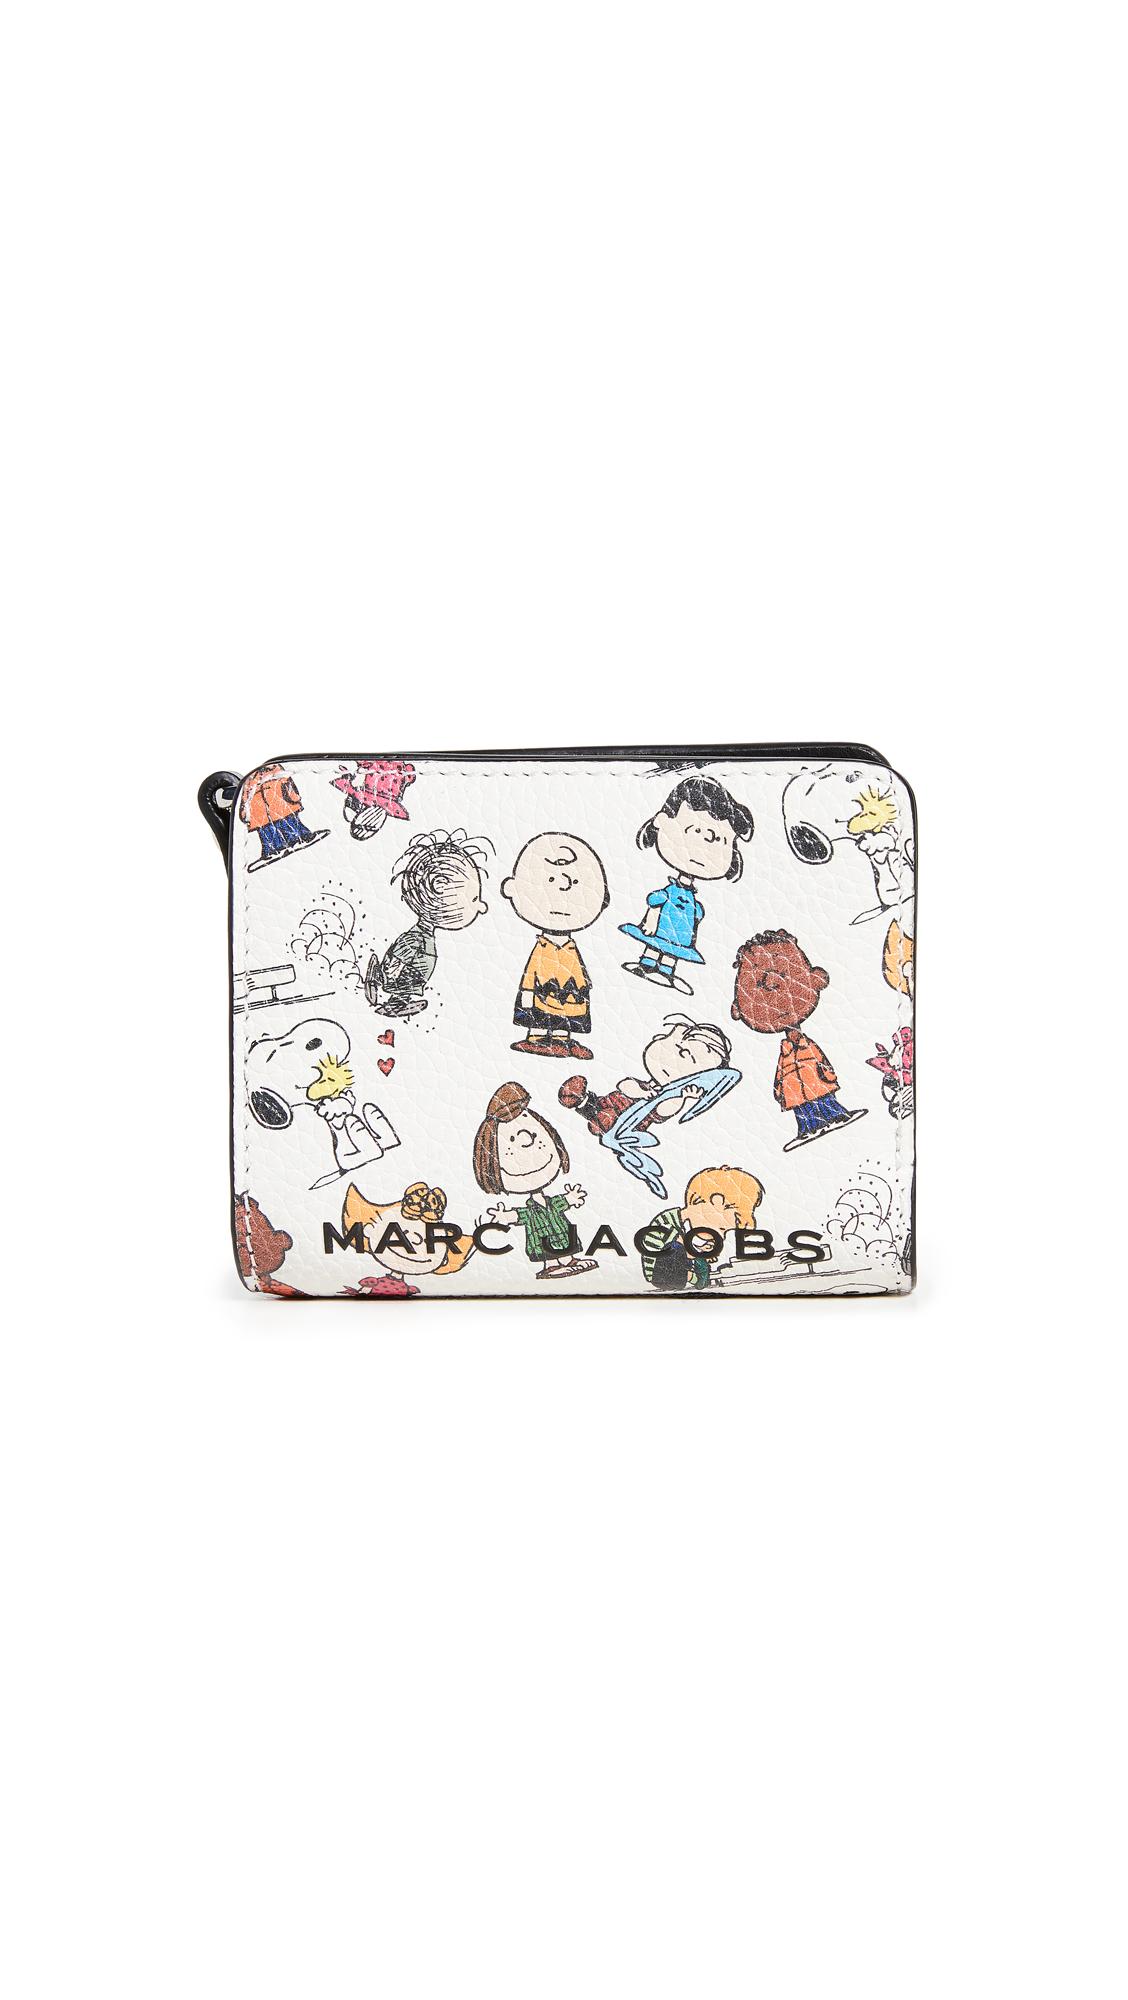 The Marc Jacobs x Peanuts Mini Compact Wallet